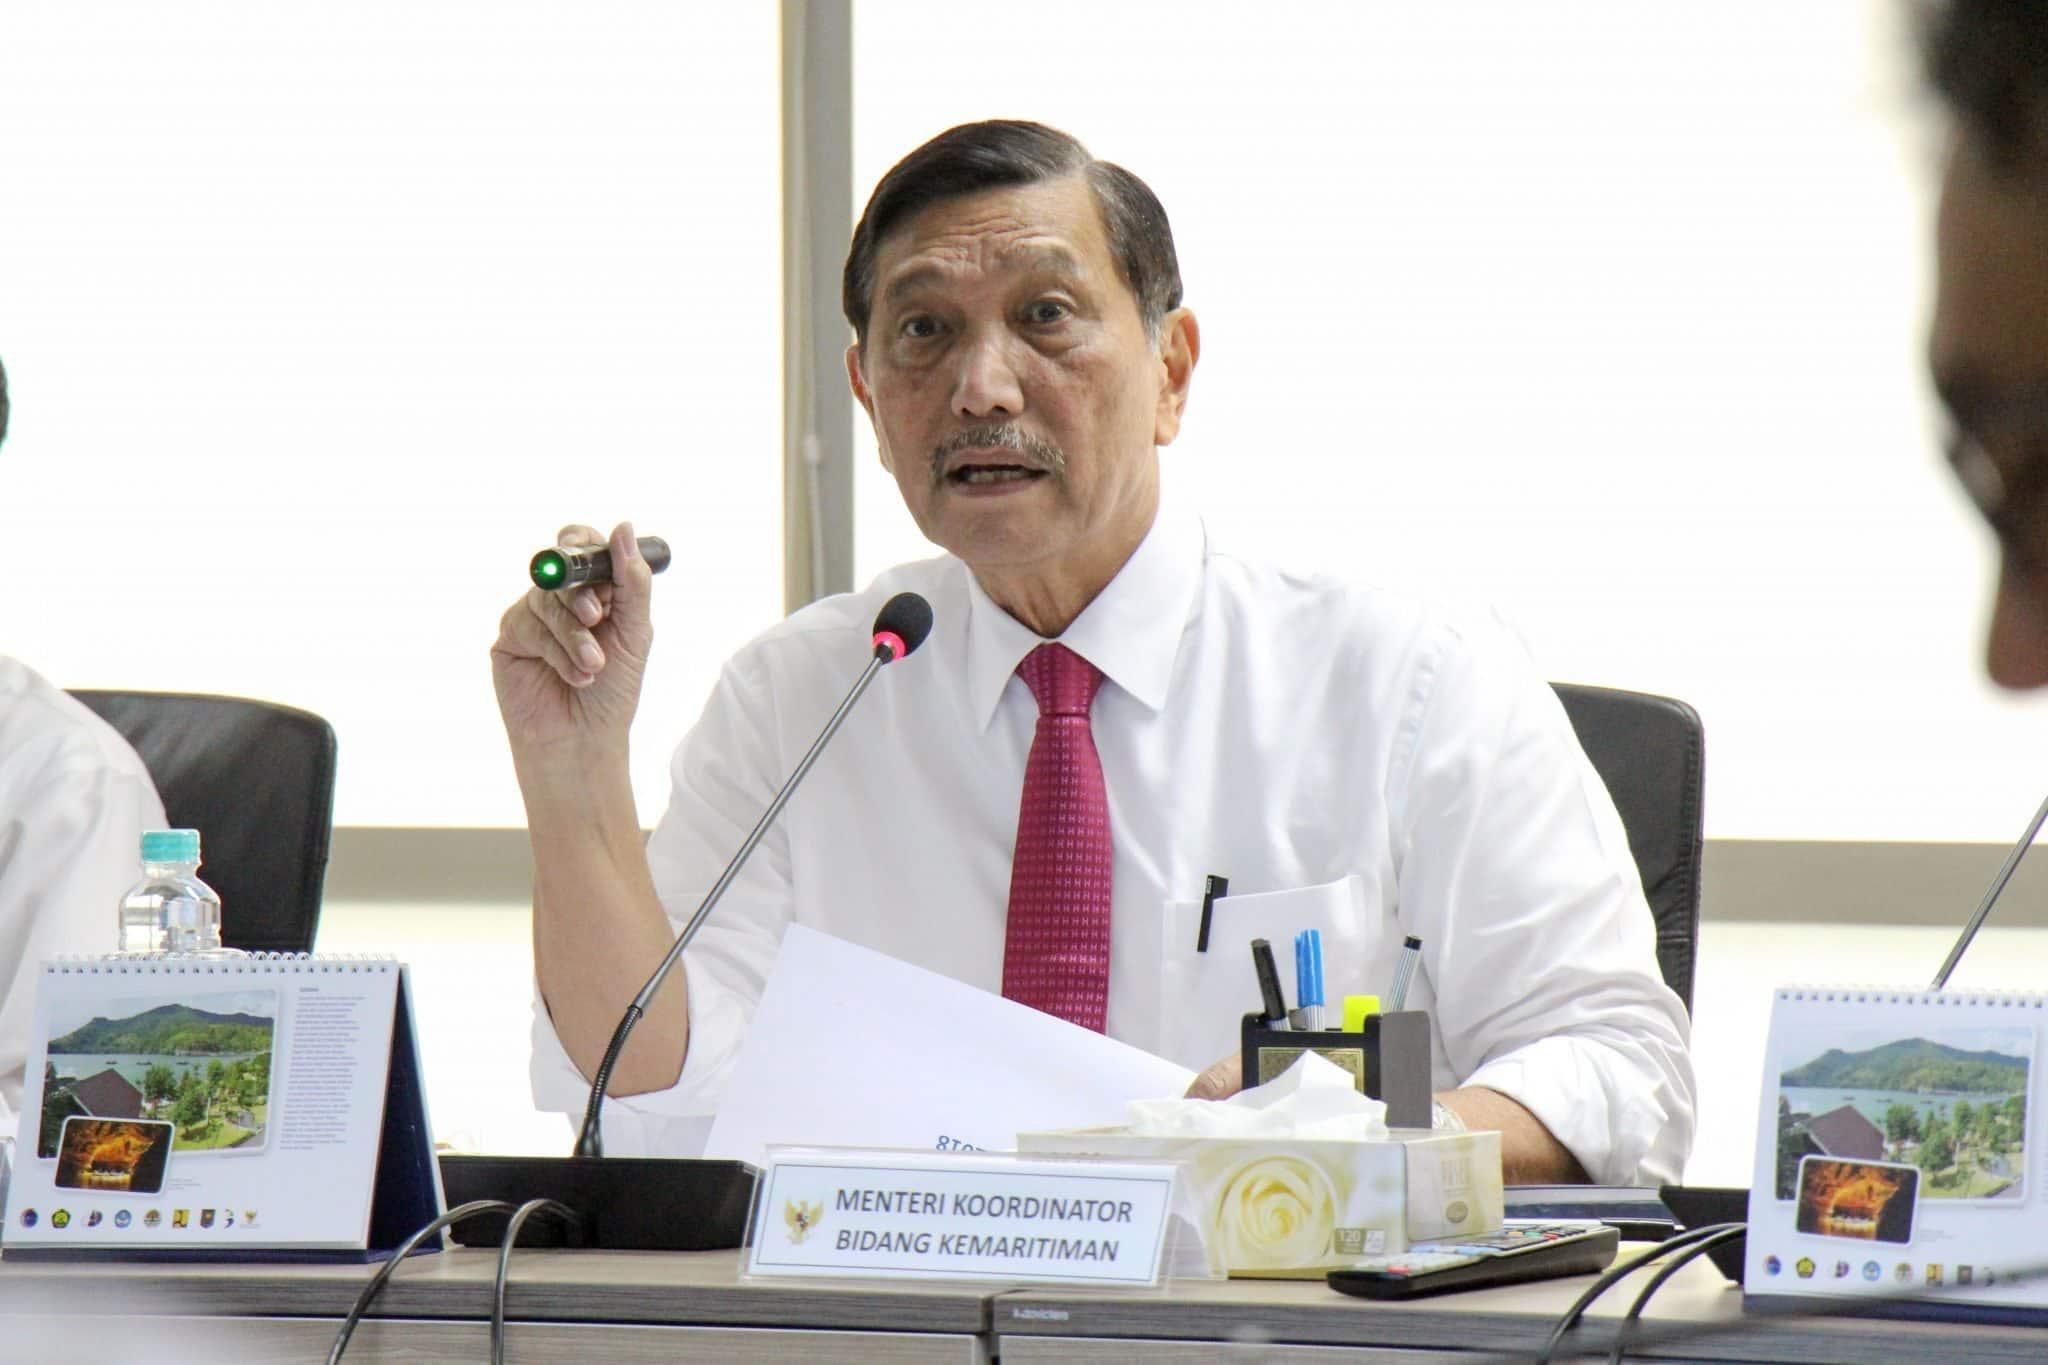 Menko Luhut B. Pandjaitan Pimpin Rakor Persiapan IMF-World Bank Annual Meeting di Bali Tahun 2018